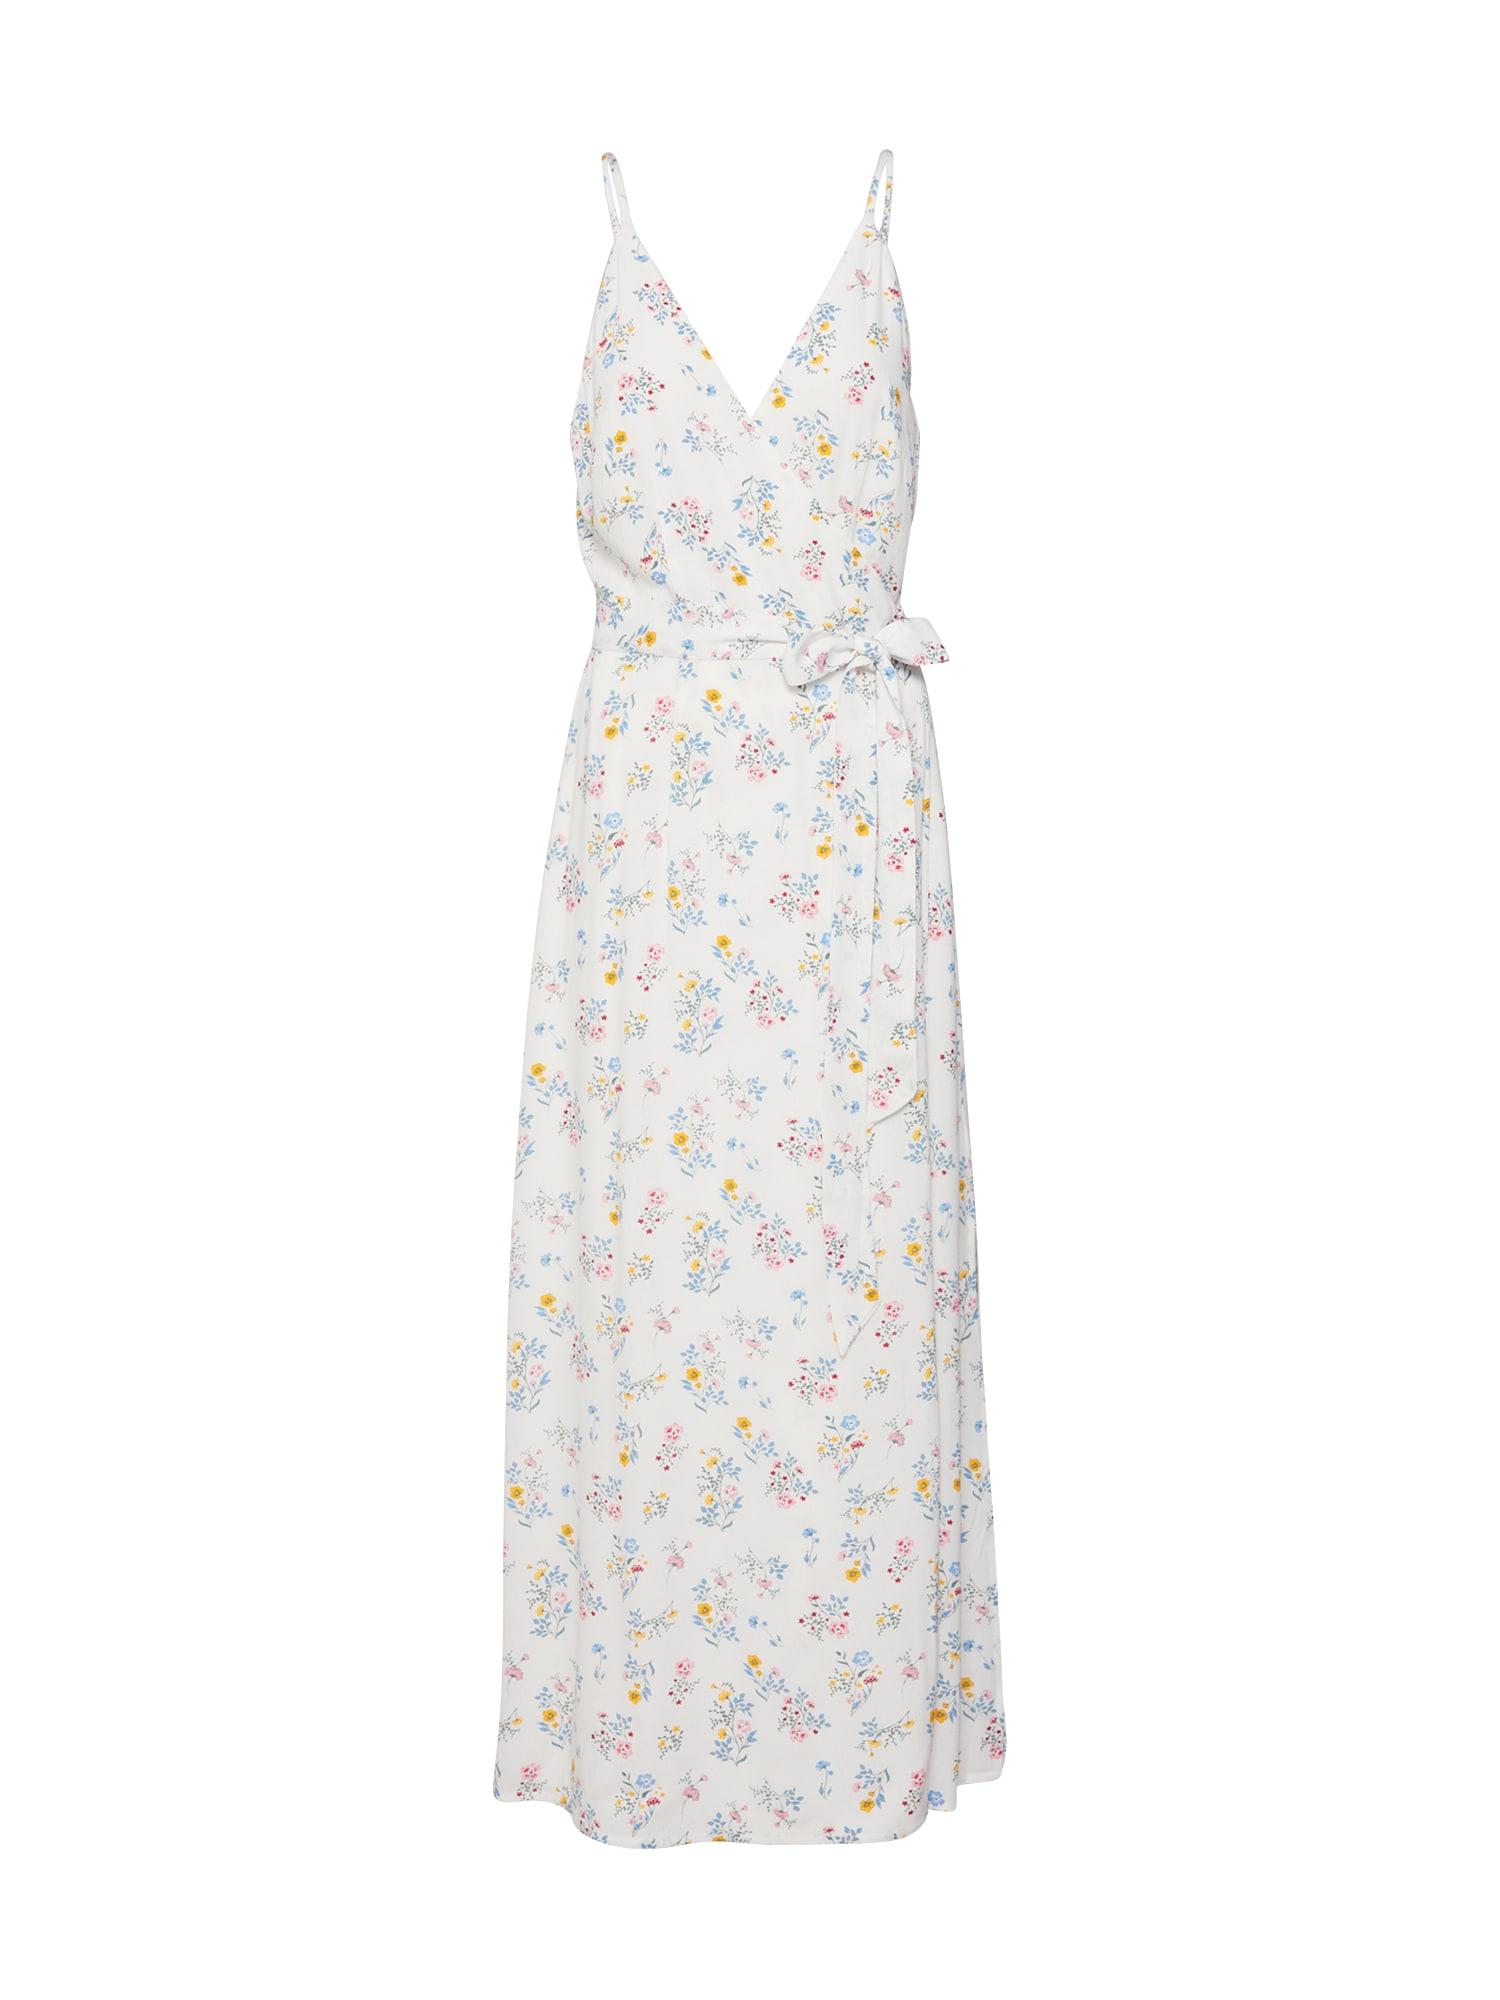 Letní šaty Roslyn modrá žlutá bílá EDITED